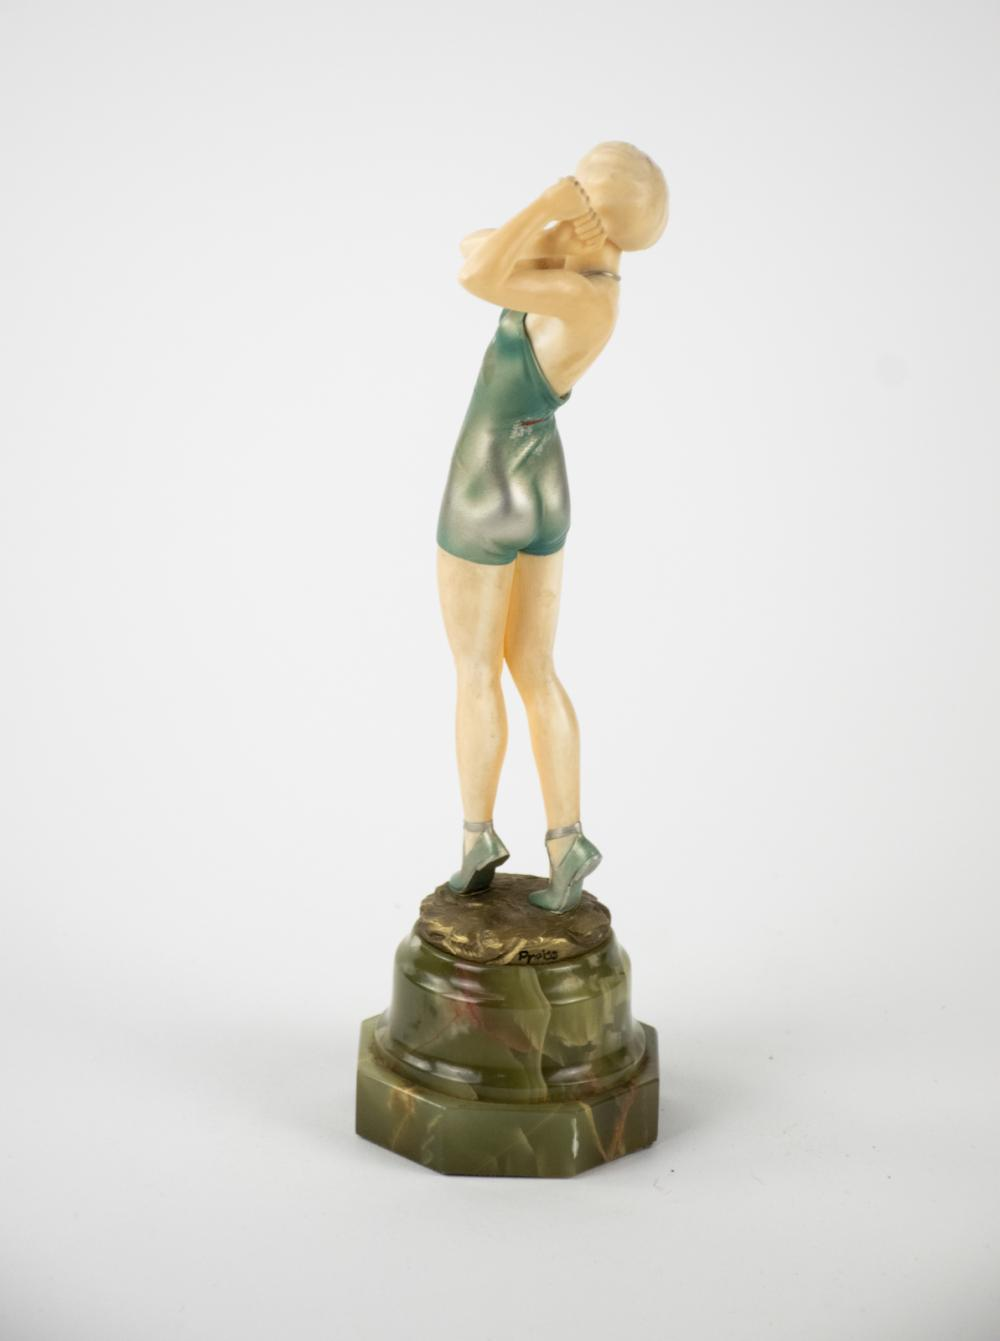 Ferdinand Preiss 'Golfer' Cold Painted Bronze Sculpture